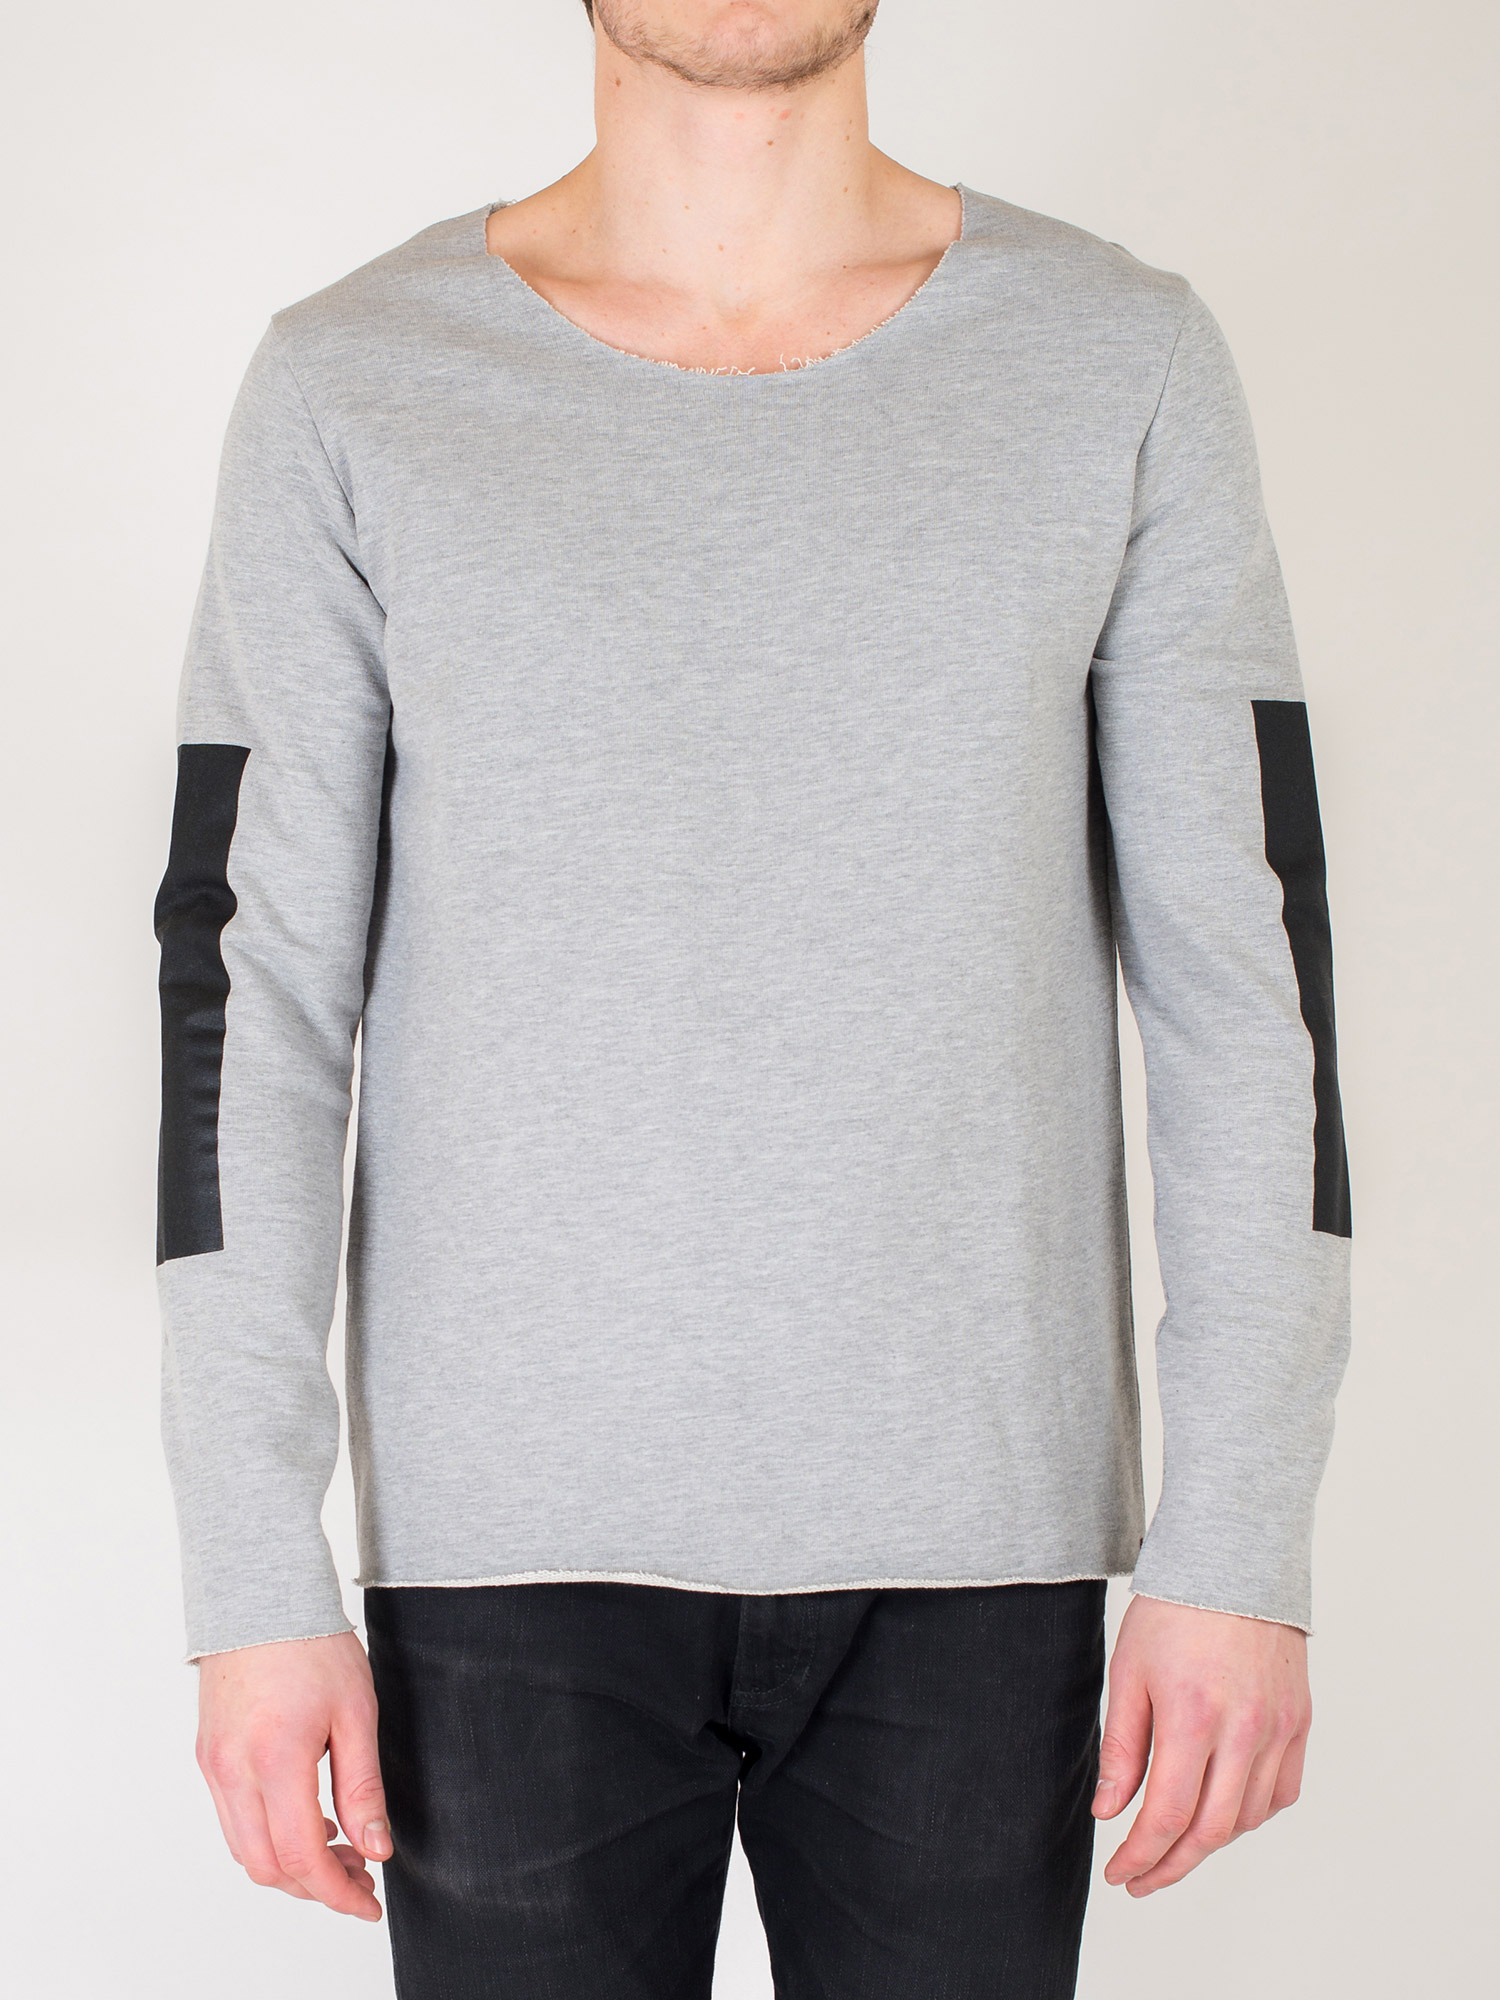 Patrick-grey-front-redigera